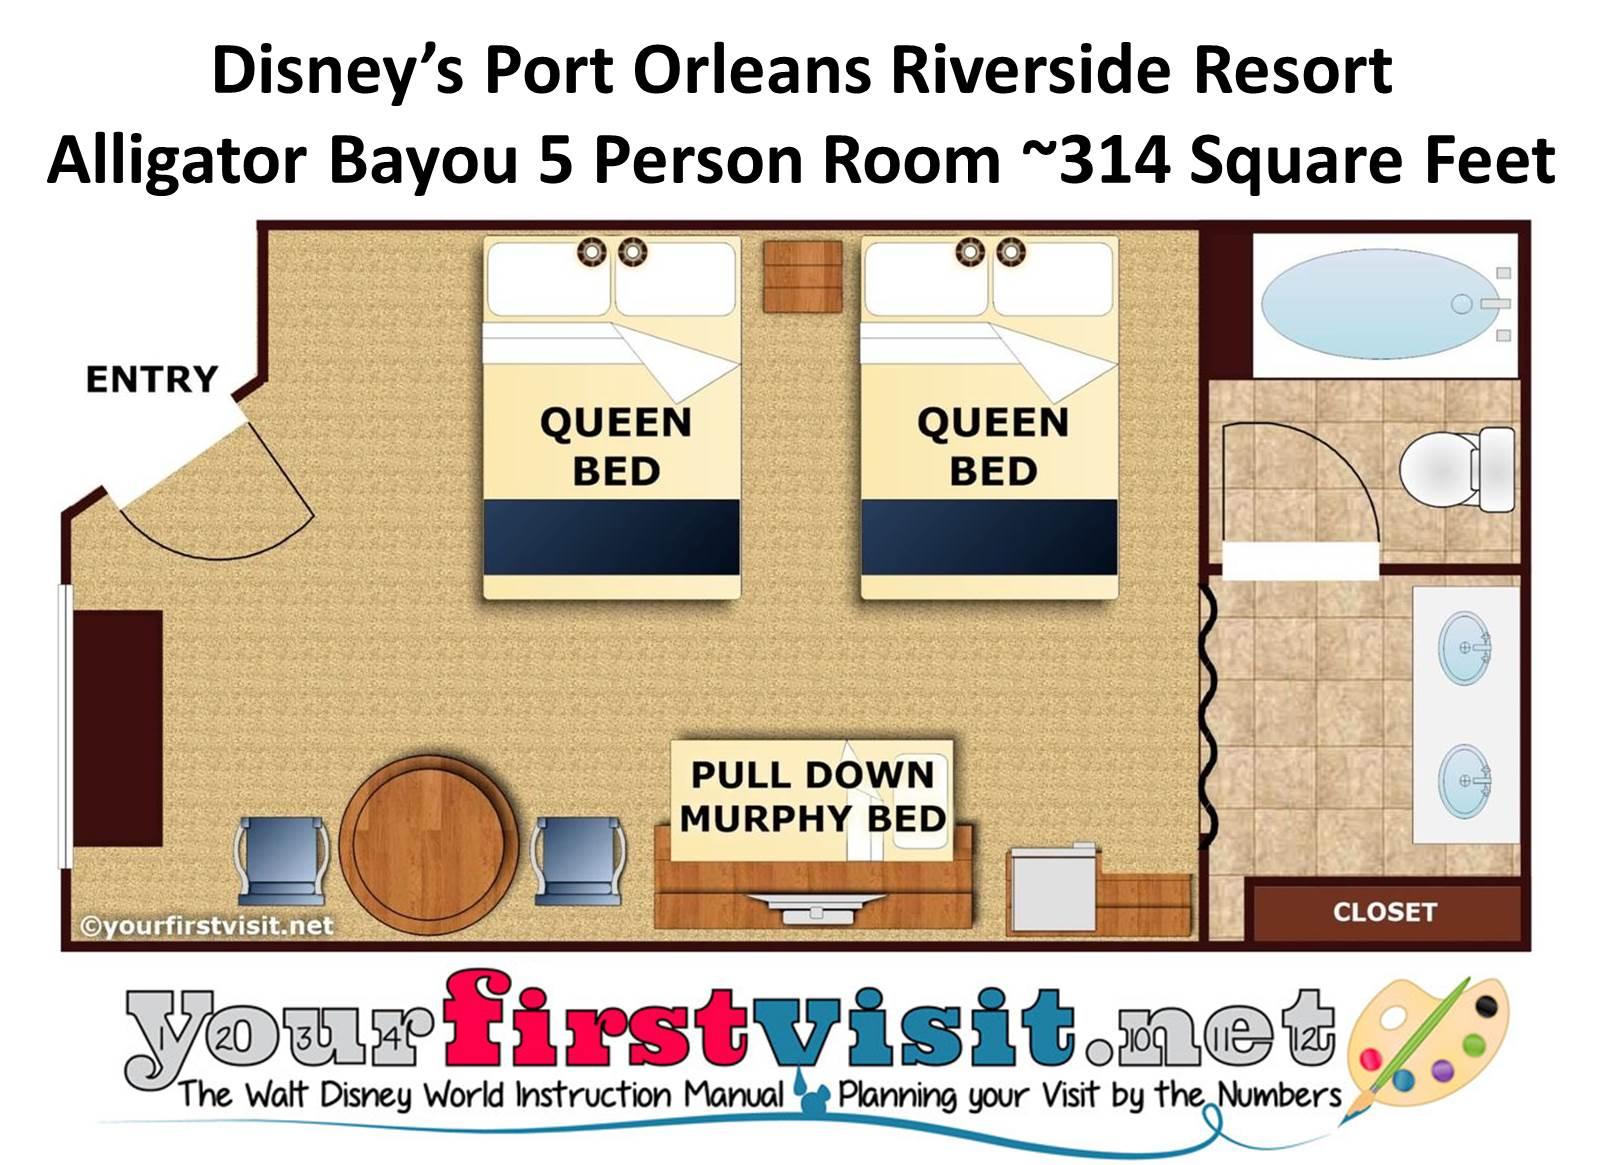 Port Orleans Riverside Alligator Bayou 5 Person Room Floor Plan from yourfirstvisit.net